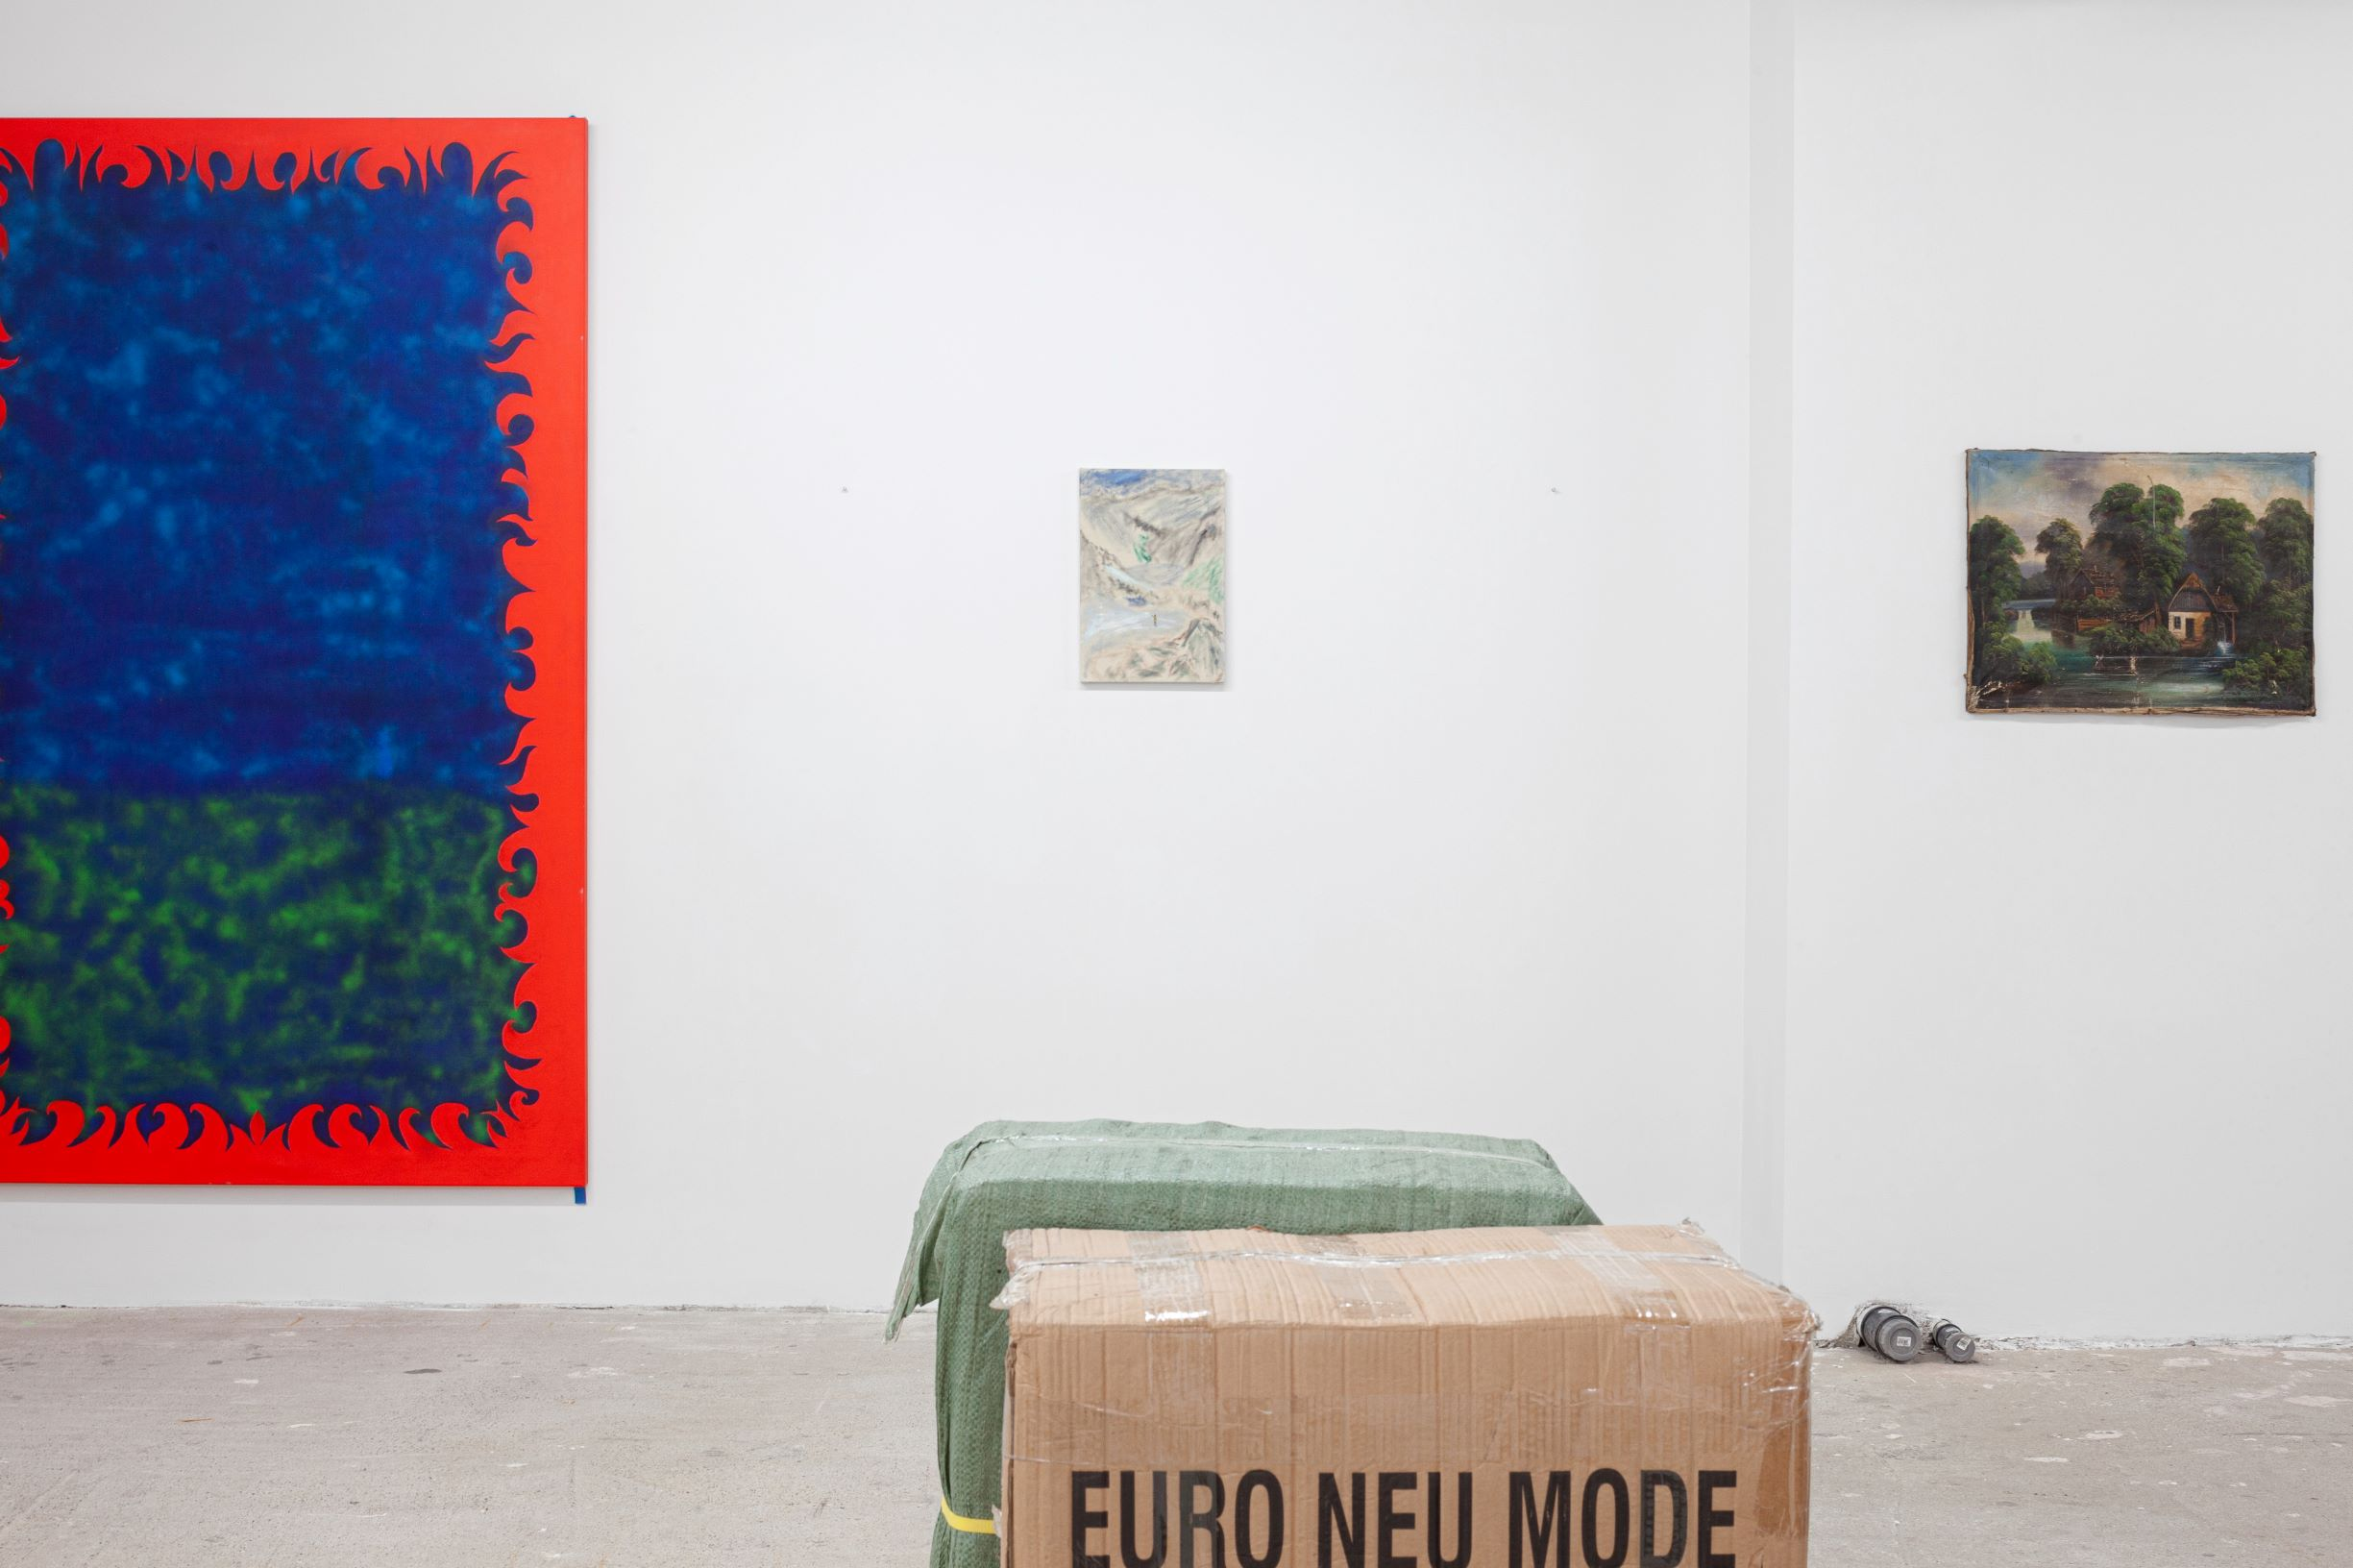 Gallery shots by Sylvia Cappellari, Euro Neu Mode, Everyday Gallery, 2020